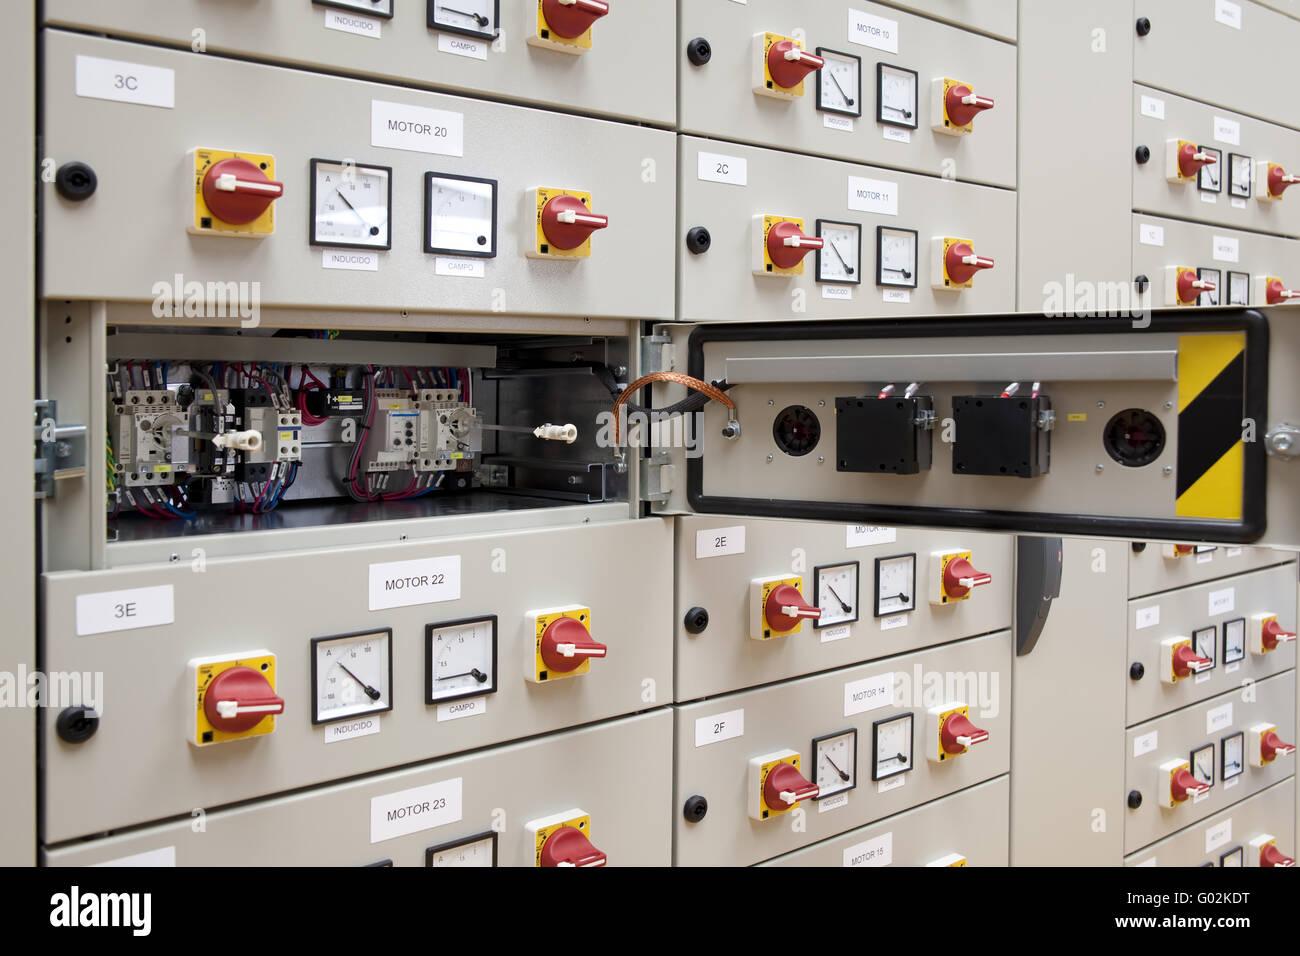 Electrical panel board Stock Photo: 103321396 - Alamy